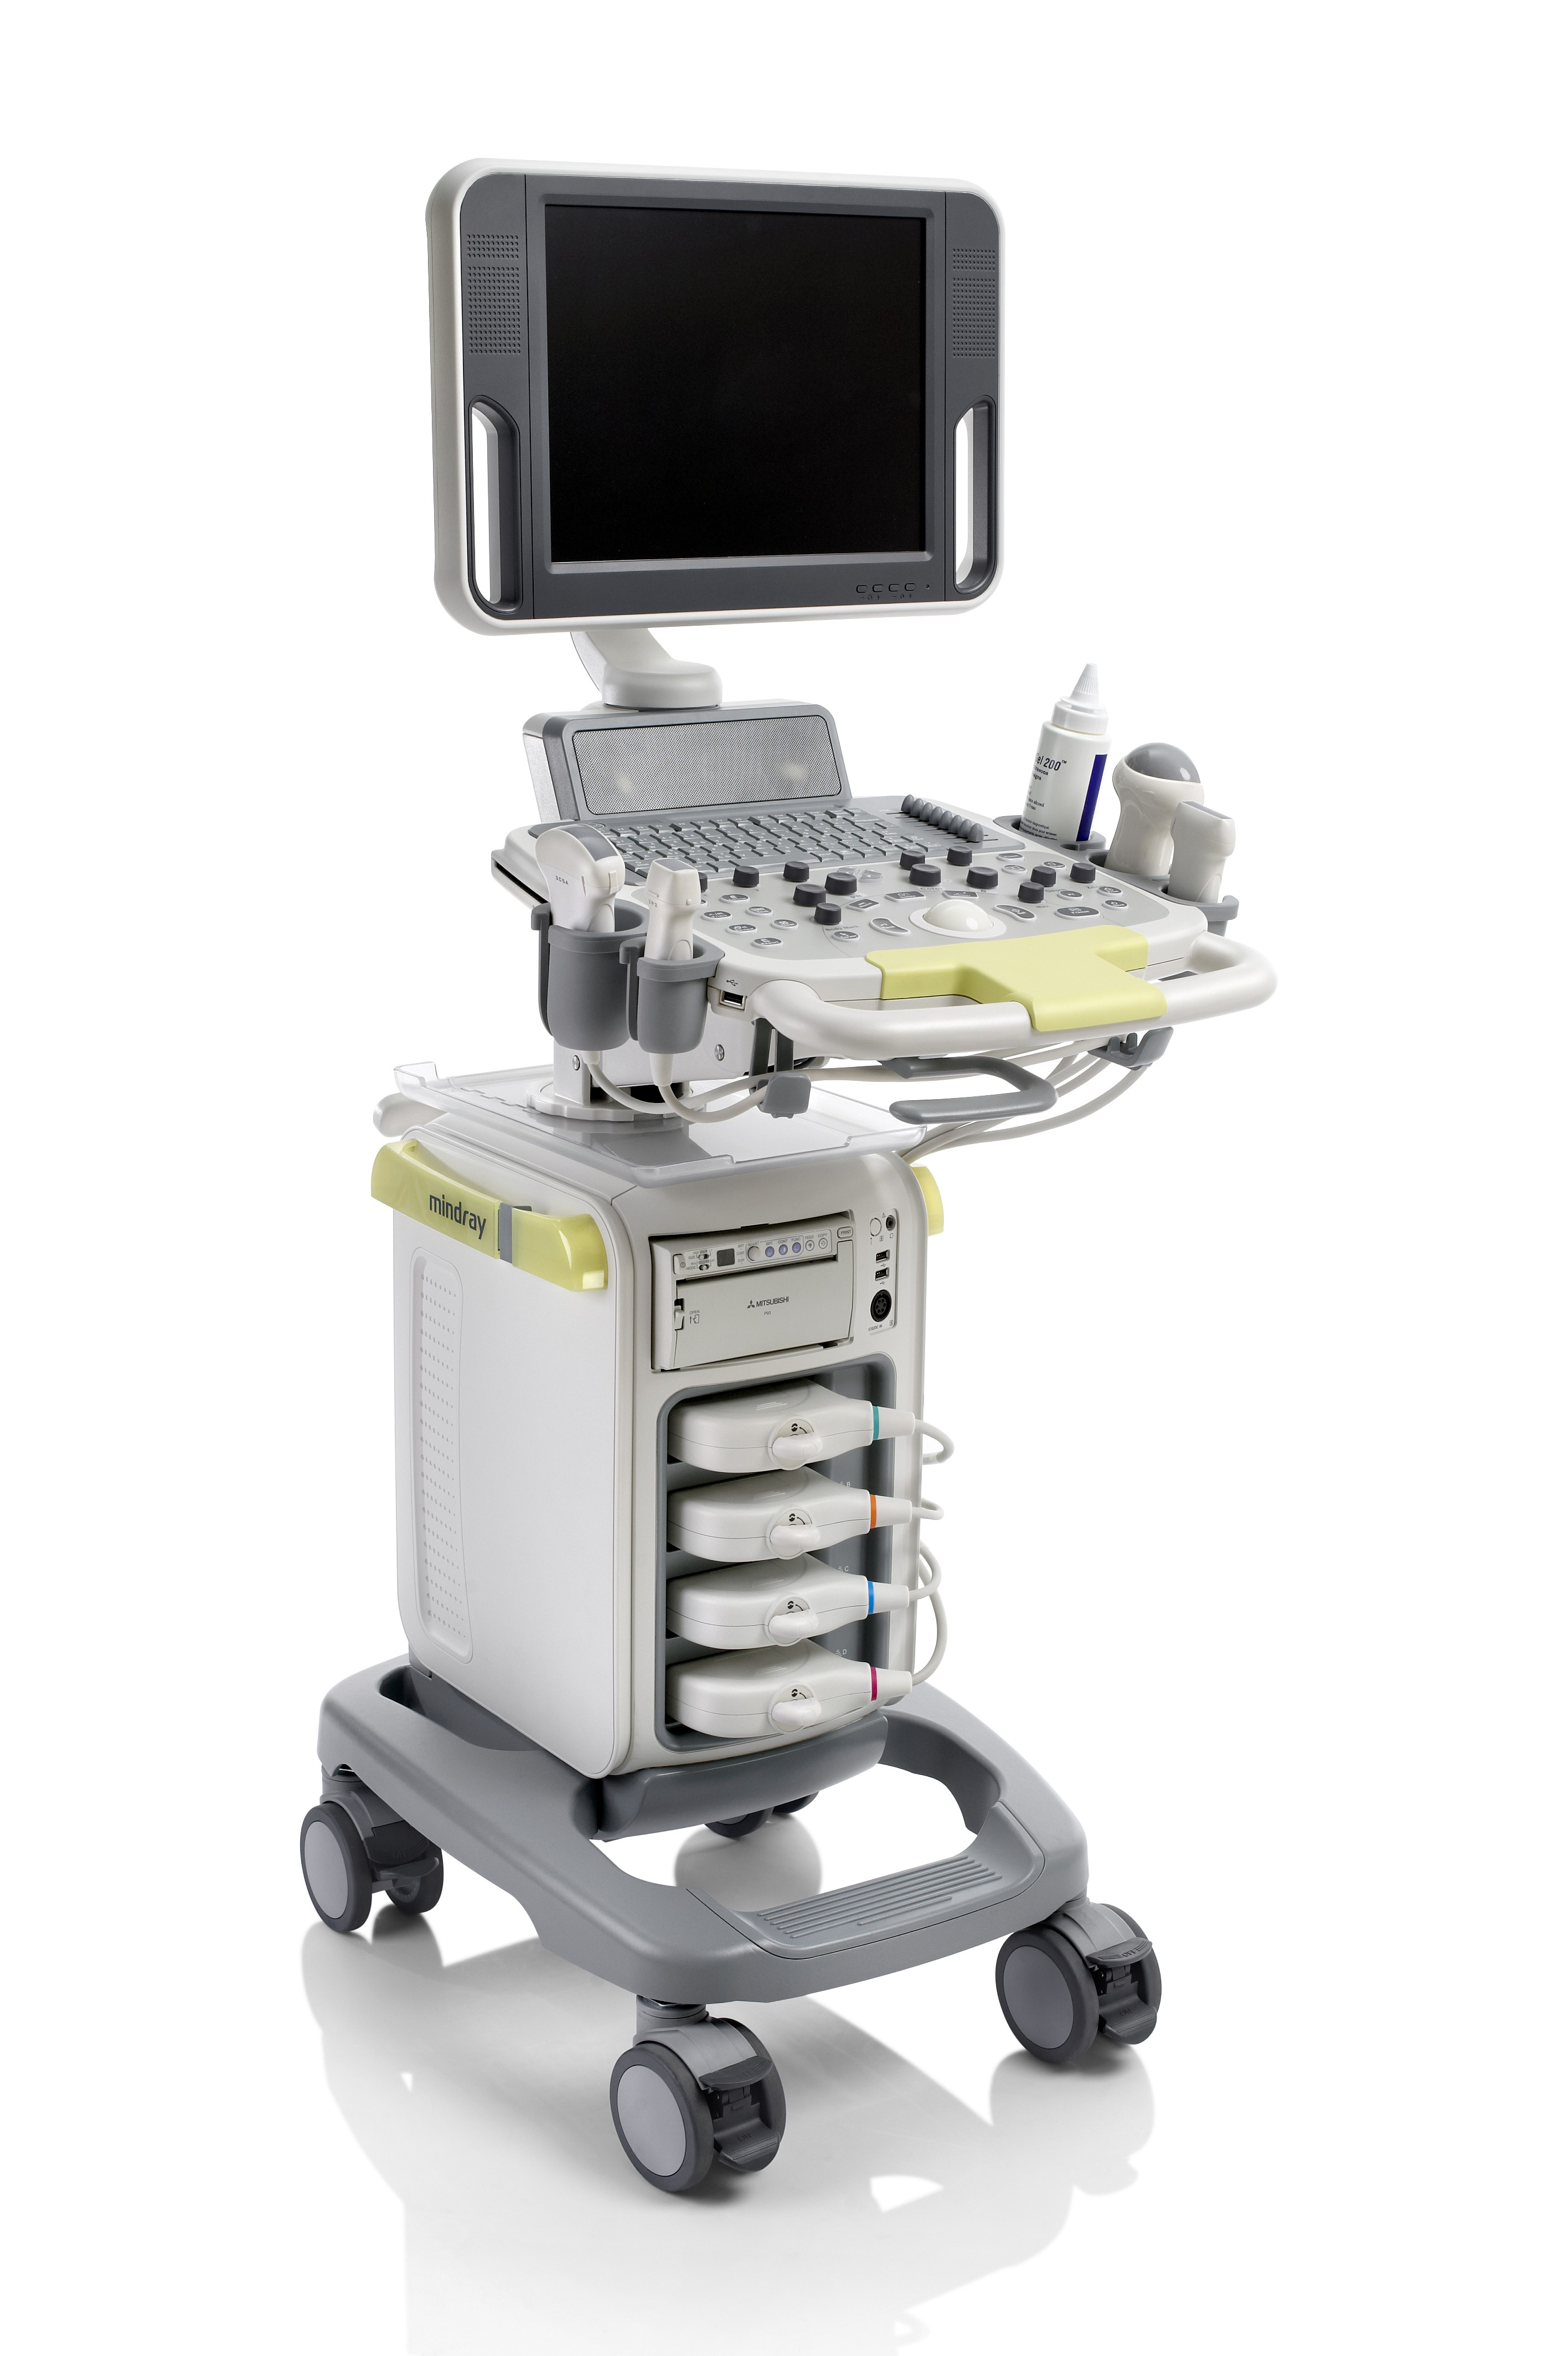 Cистема ультразвукова діагностична Mindray DC-N3 PRO